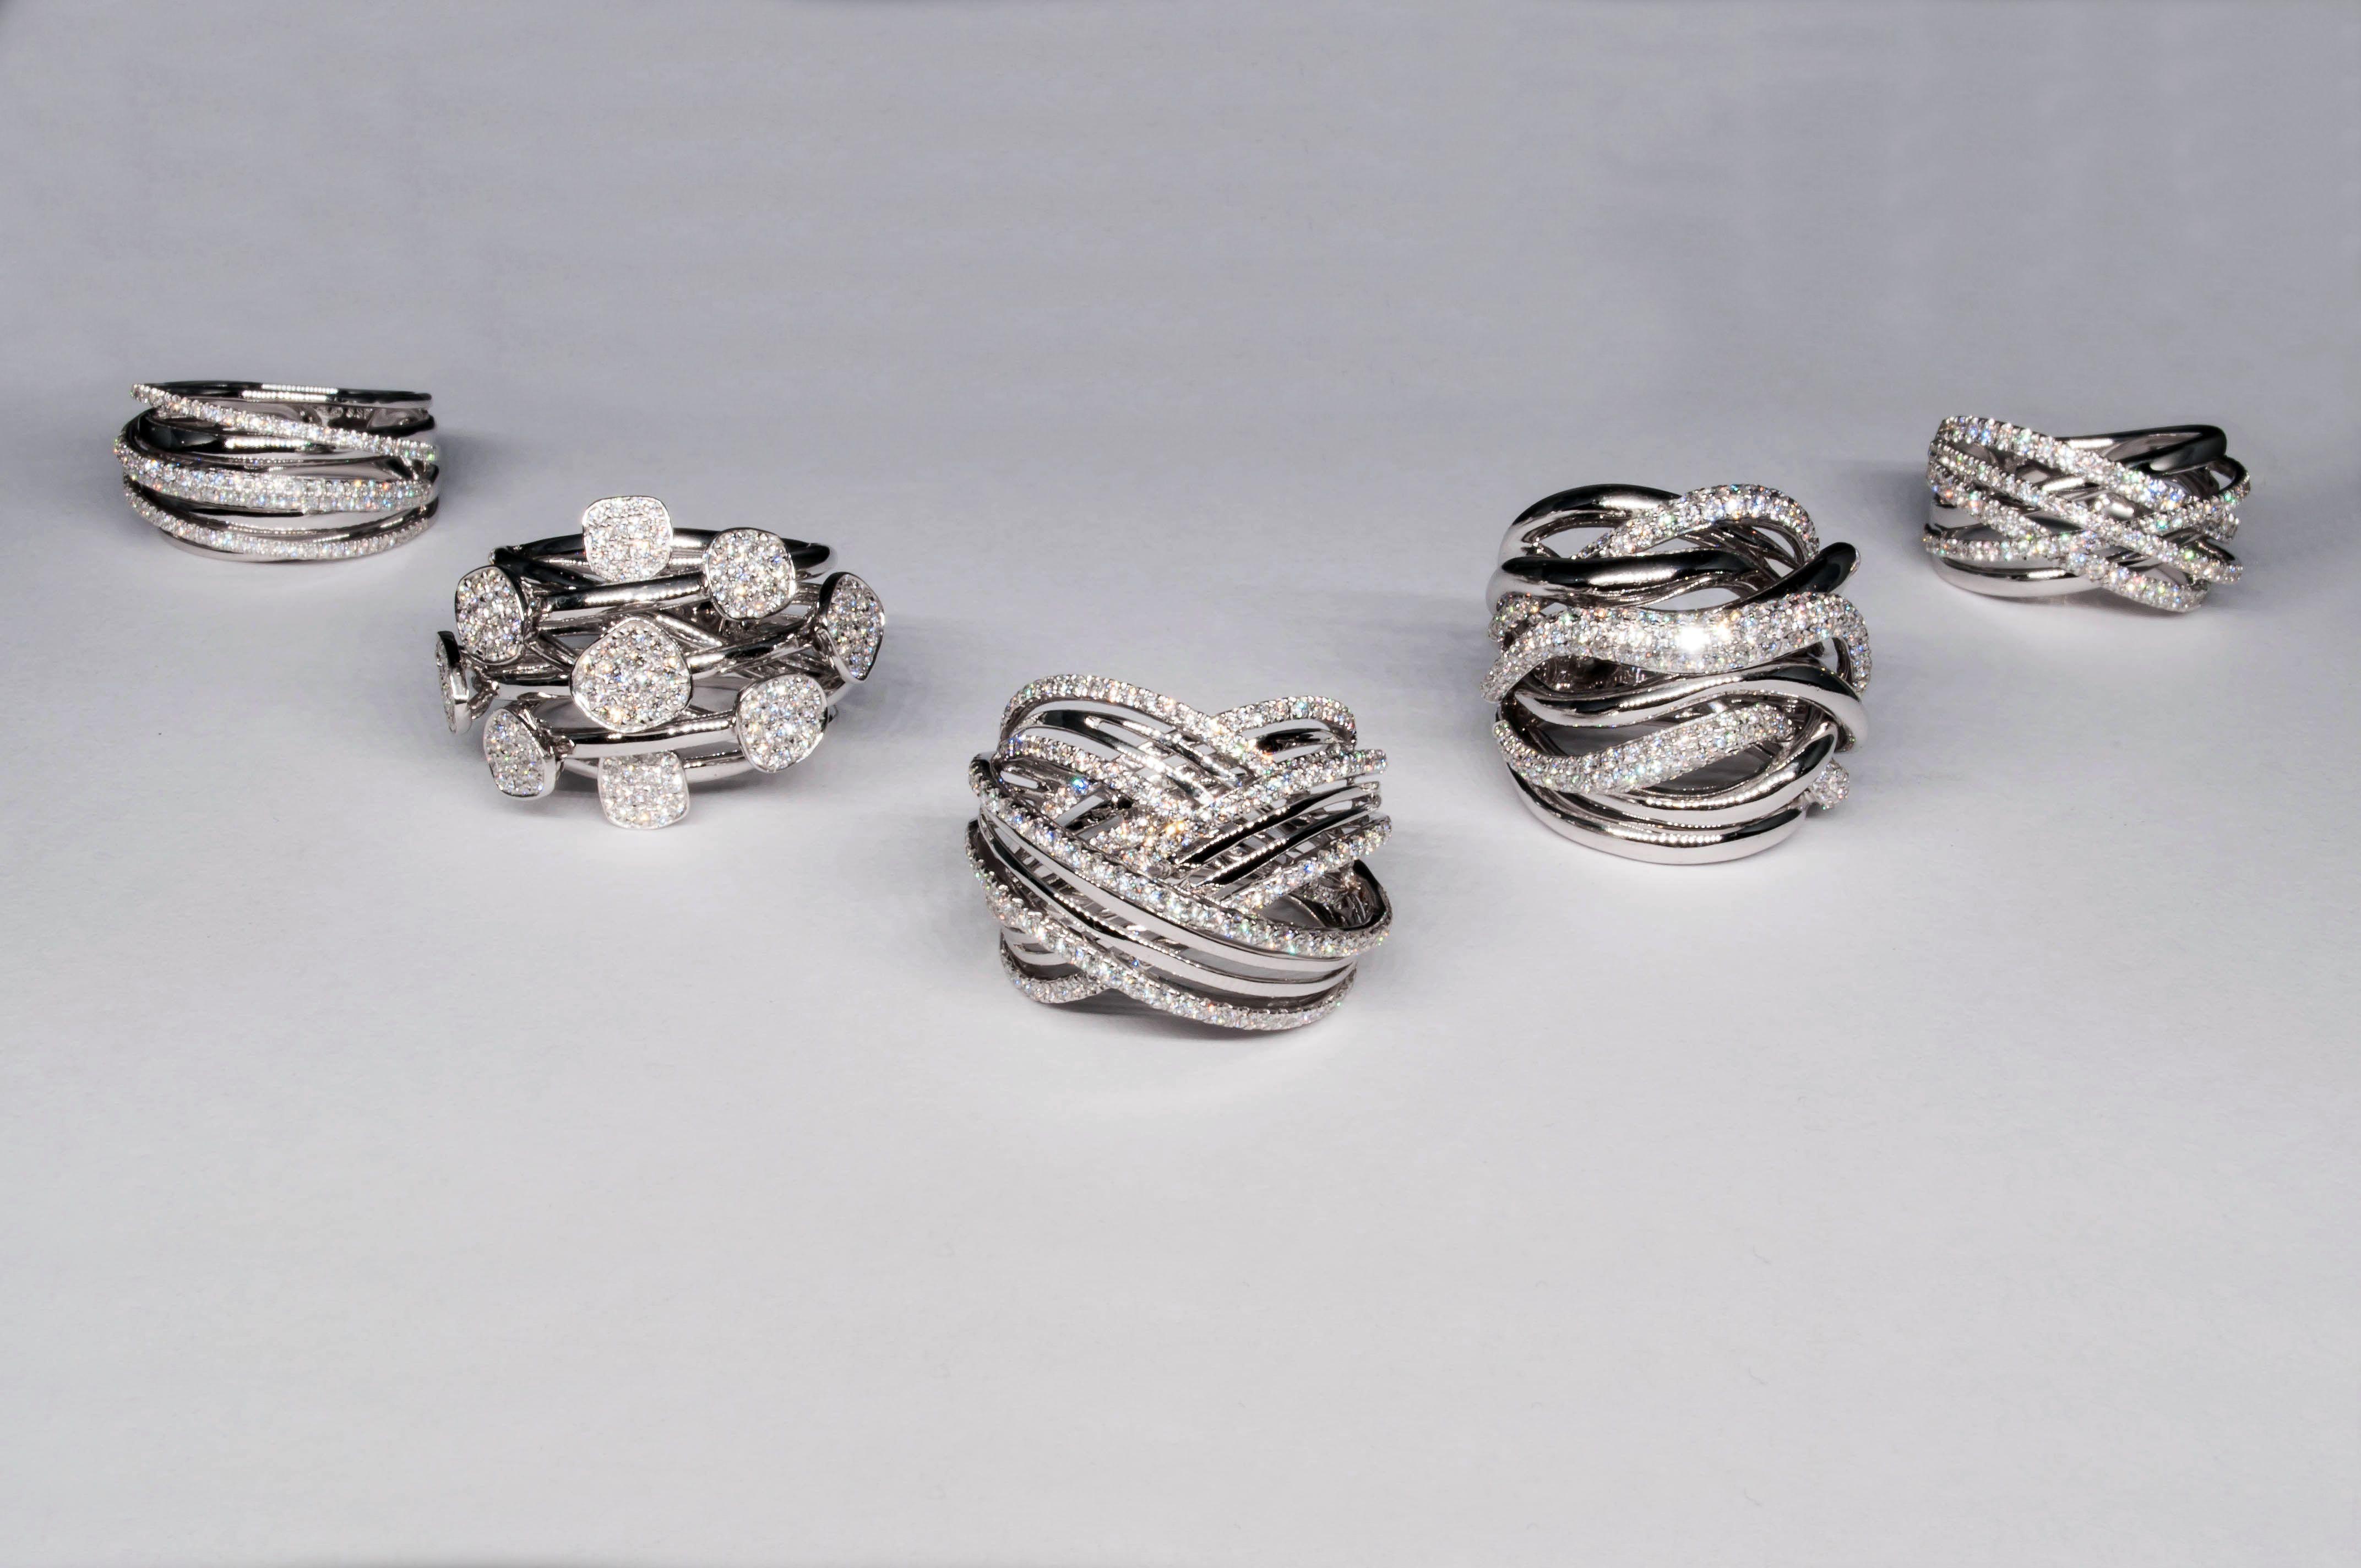 aa425bb868d4  jordanjoyeros  fabricantes  oroblanco  diamante  diamond  whitegold  diseño   design  creatividad  moda  tendencia  DiseñamosParaTi  WeDesignForYou